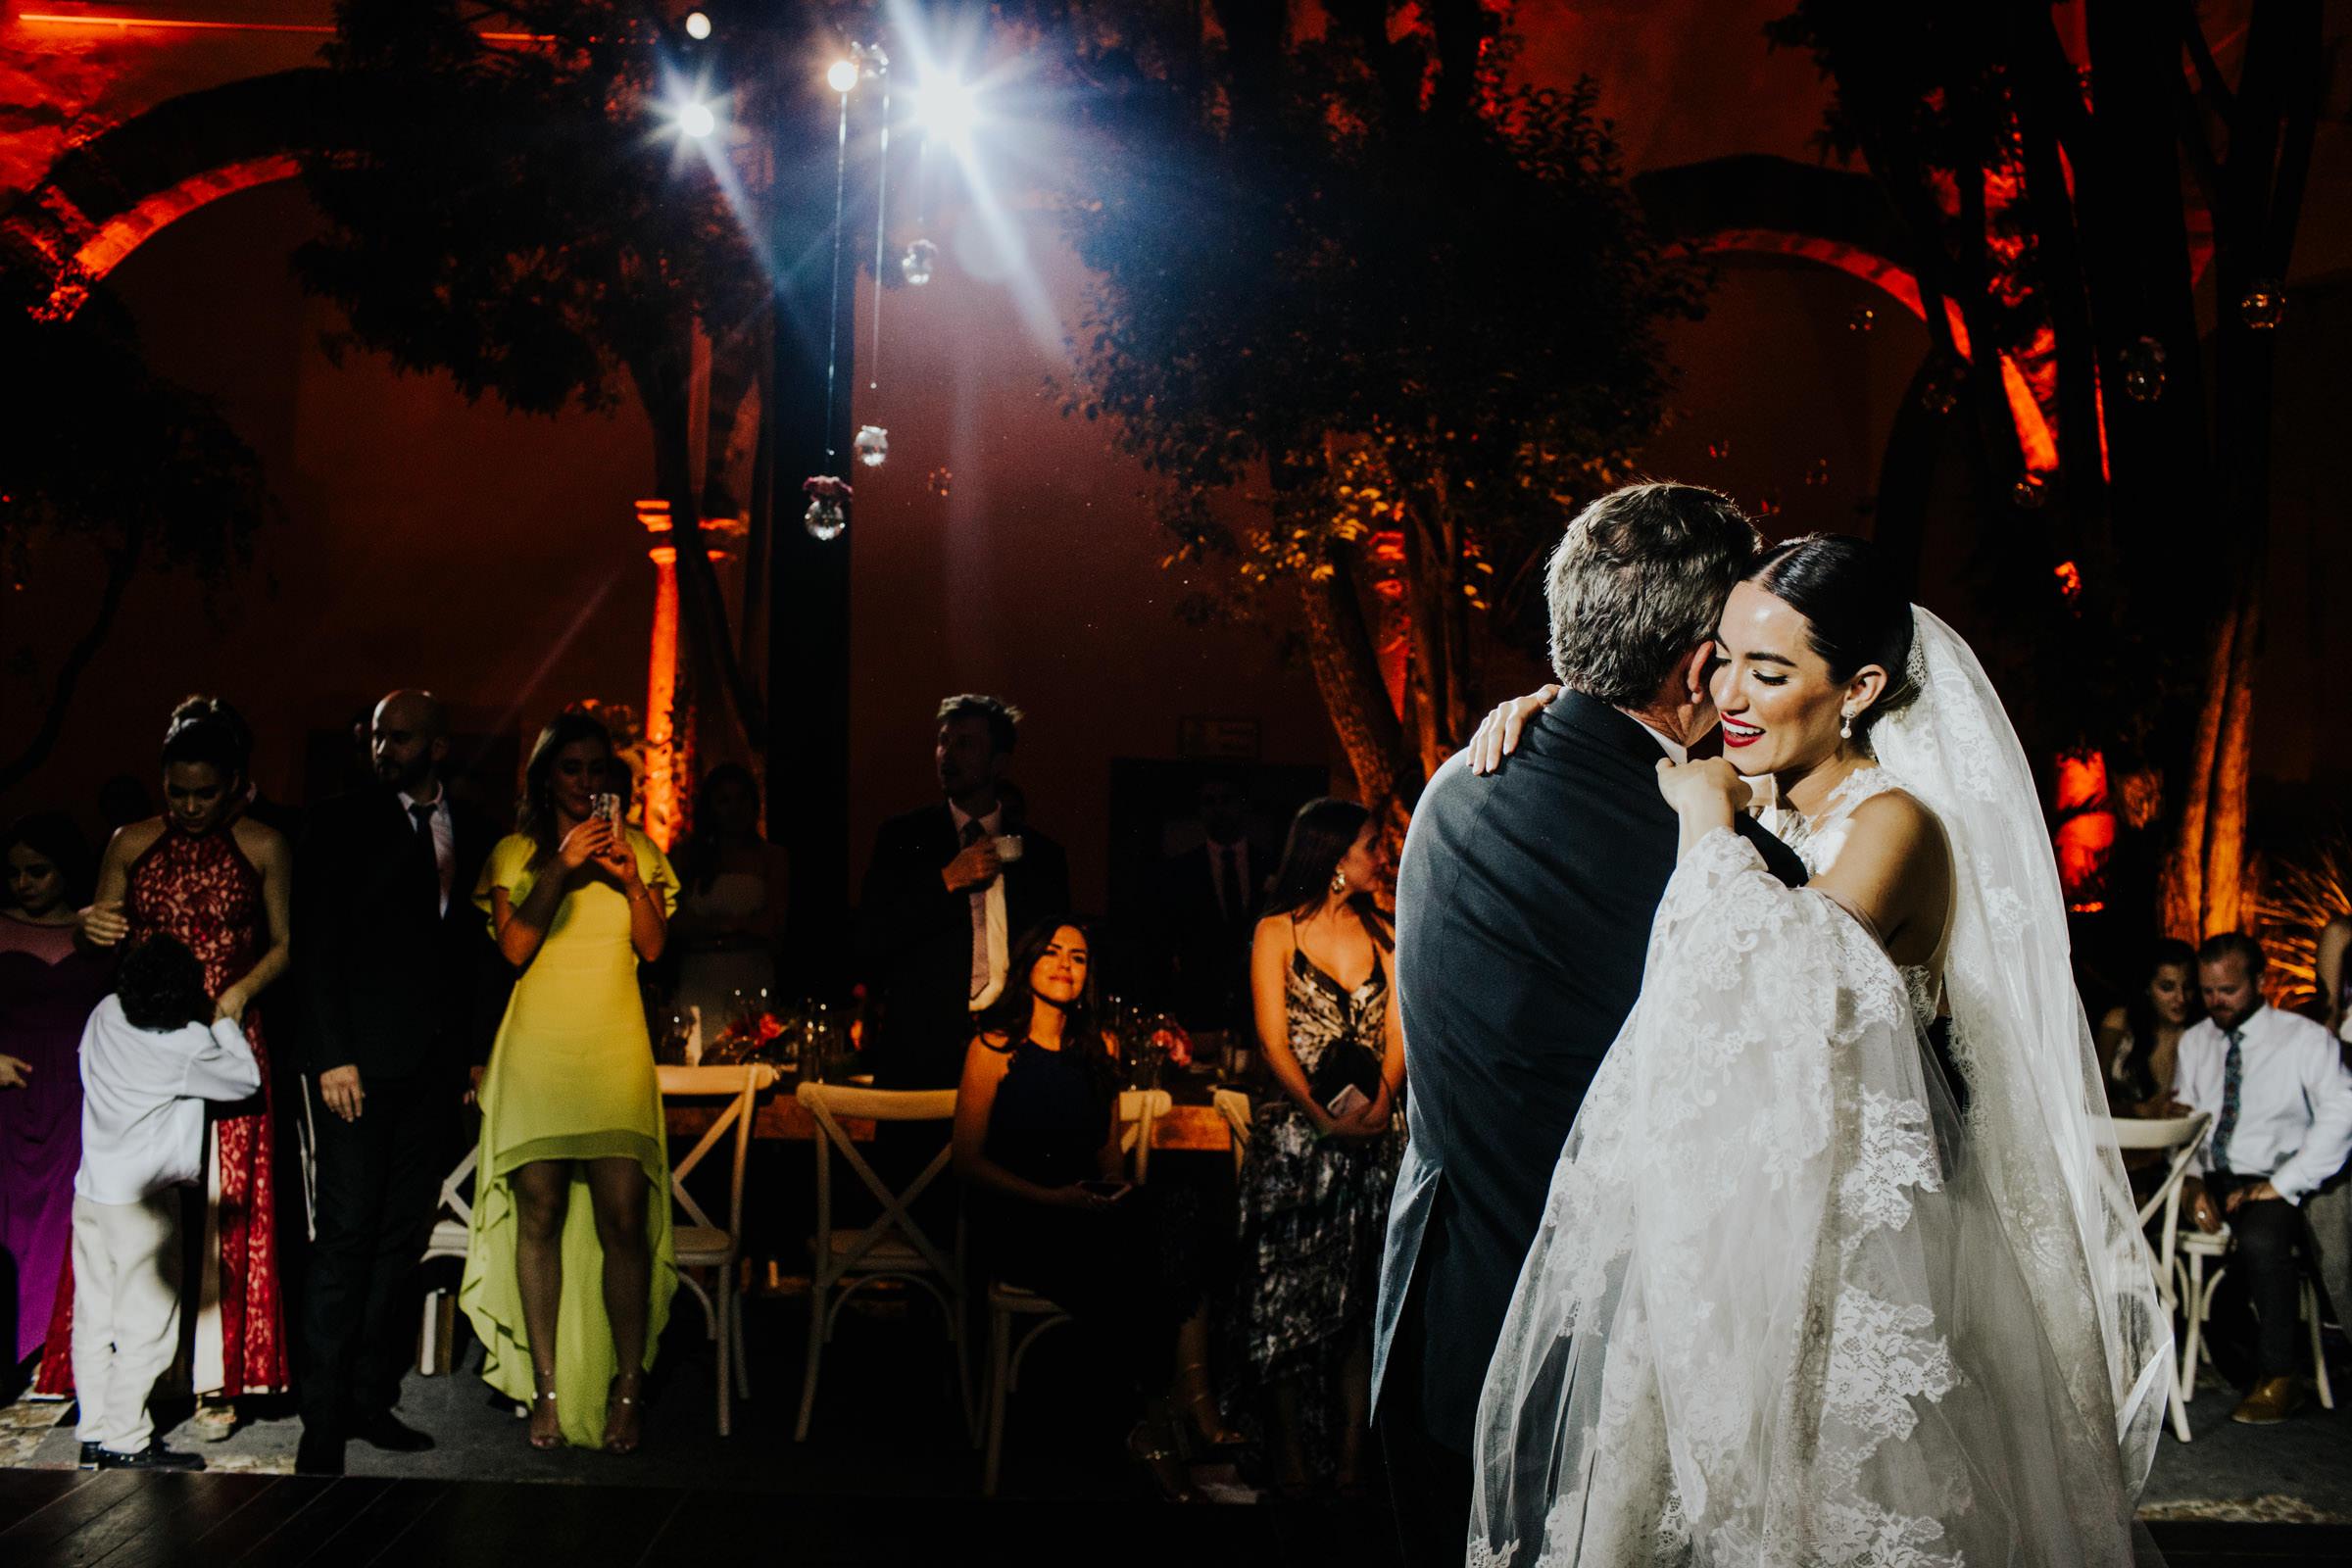 San-Miguel-de-Allende-Wedding-Photography-Parroquia-Instituto-Boda-Fotografia-Fer-Sergio-Pierce-Lifestyle-Photography0030.JPG